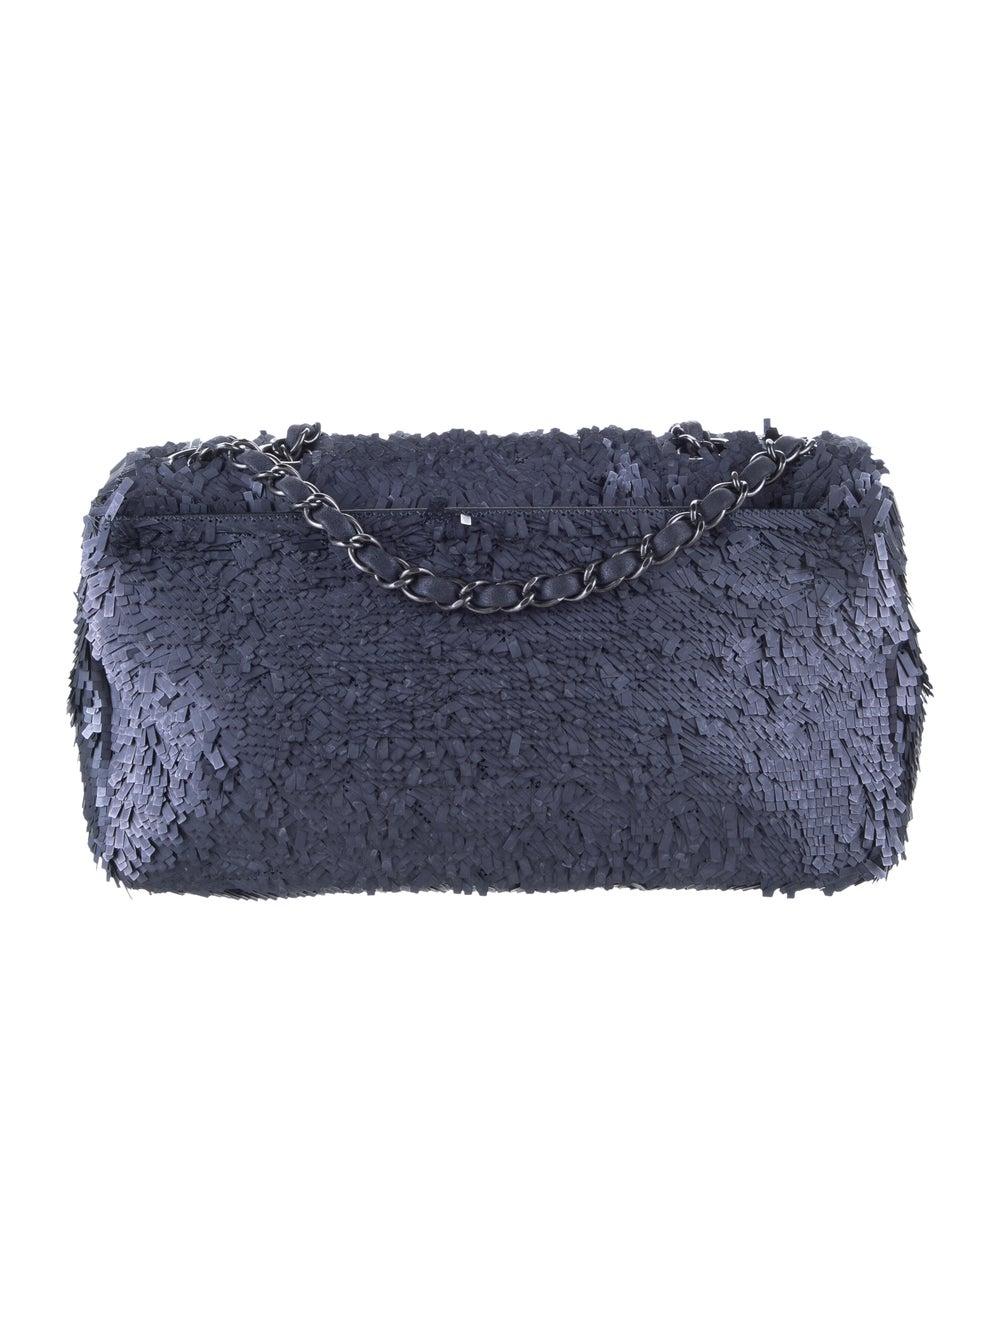 Chanel Sequin Flap Bag Blue - image 4